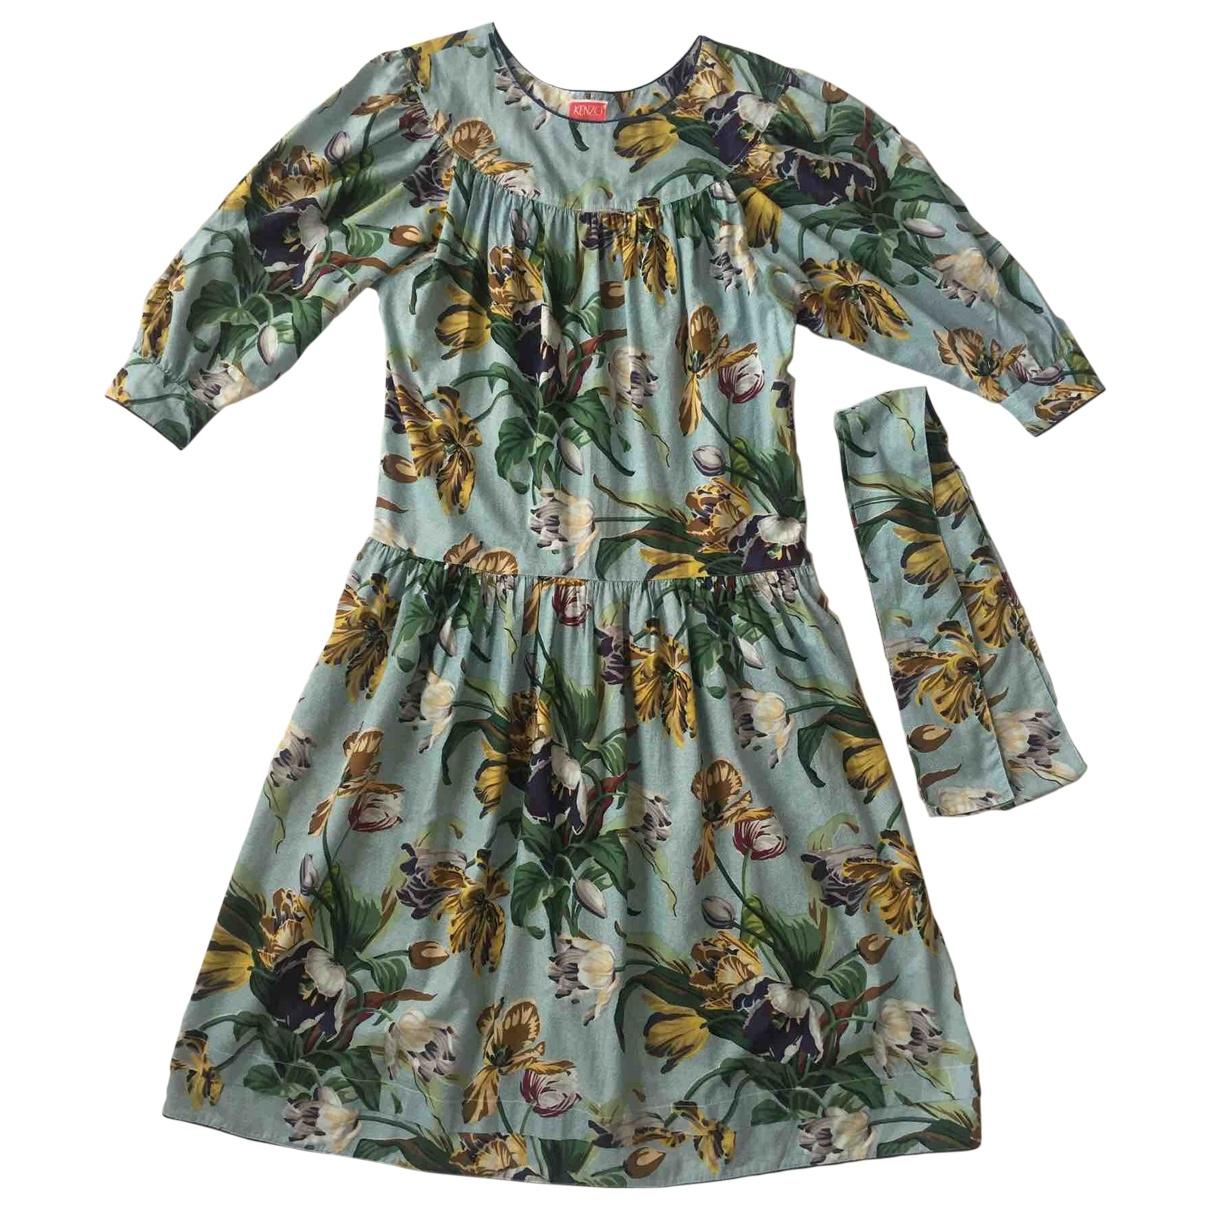 Kenzo \N Cotton dress for Women L International